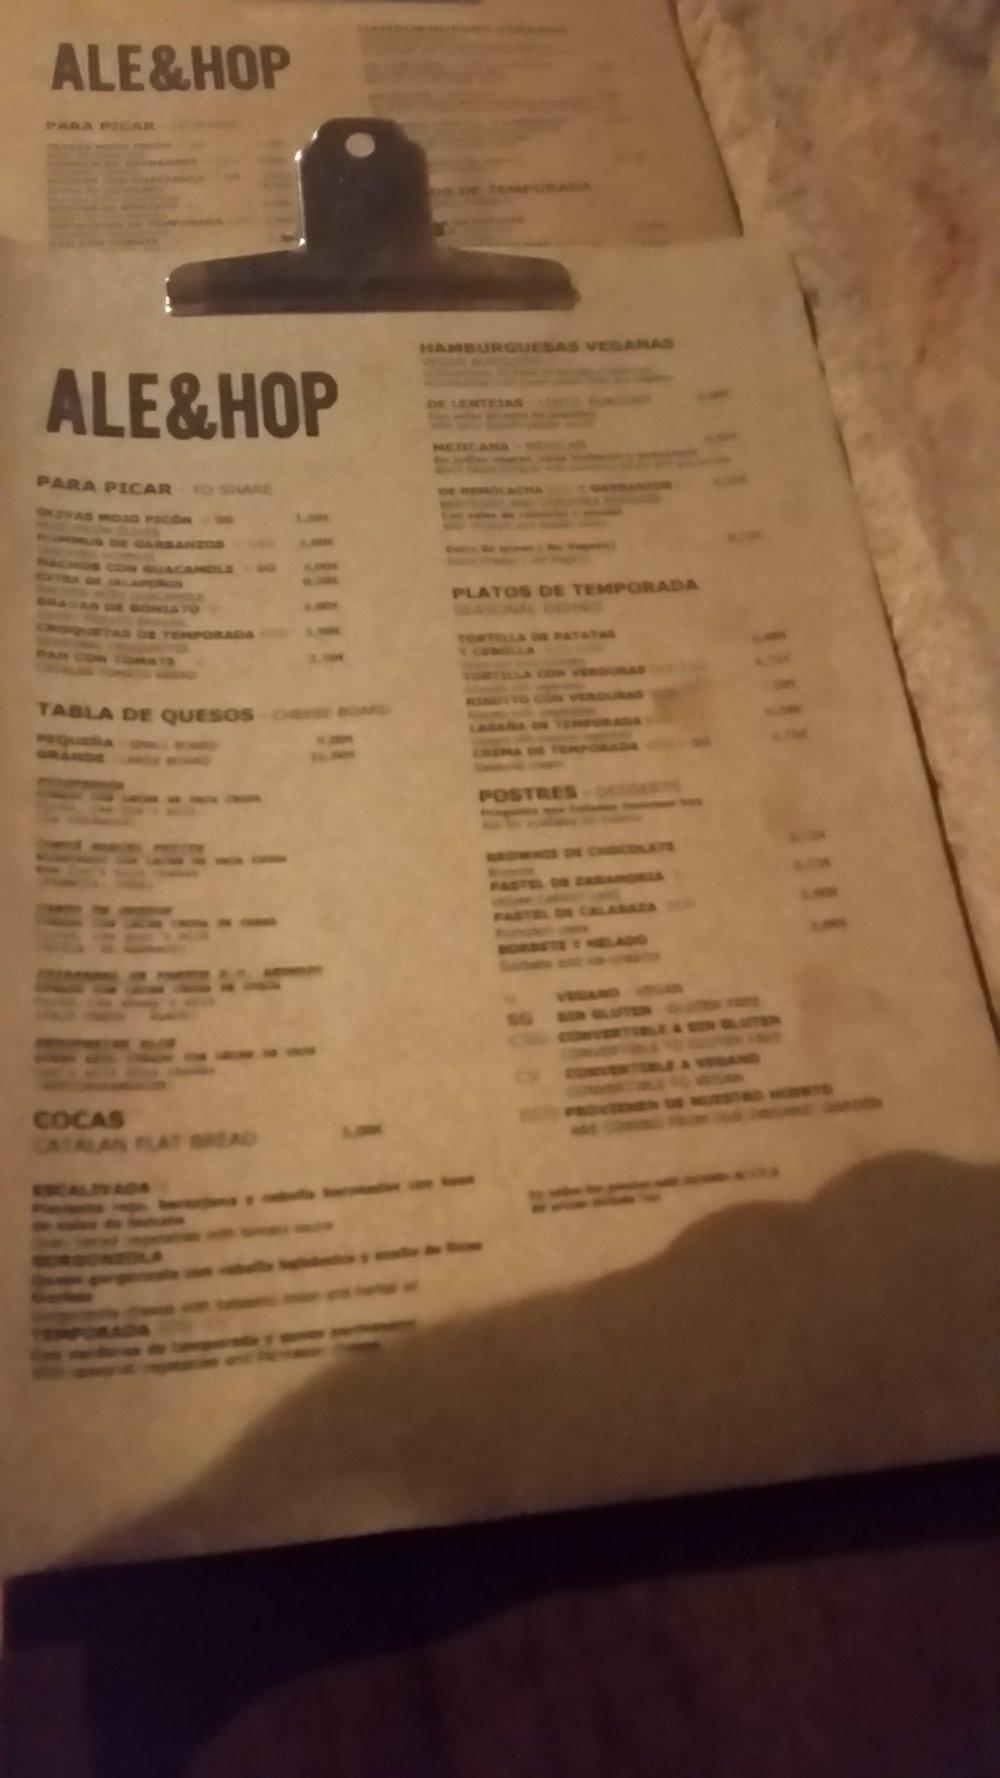 ale&hop-barcelona-menu